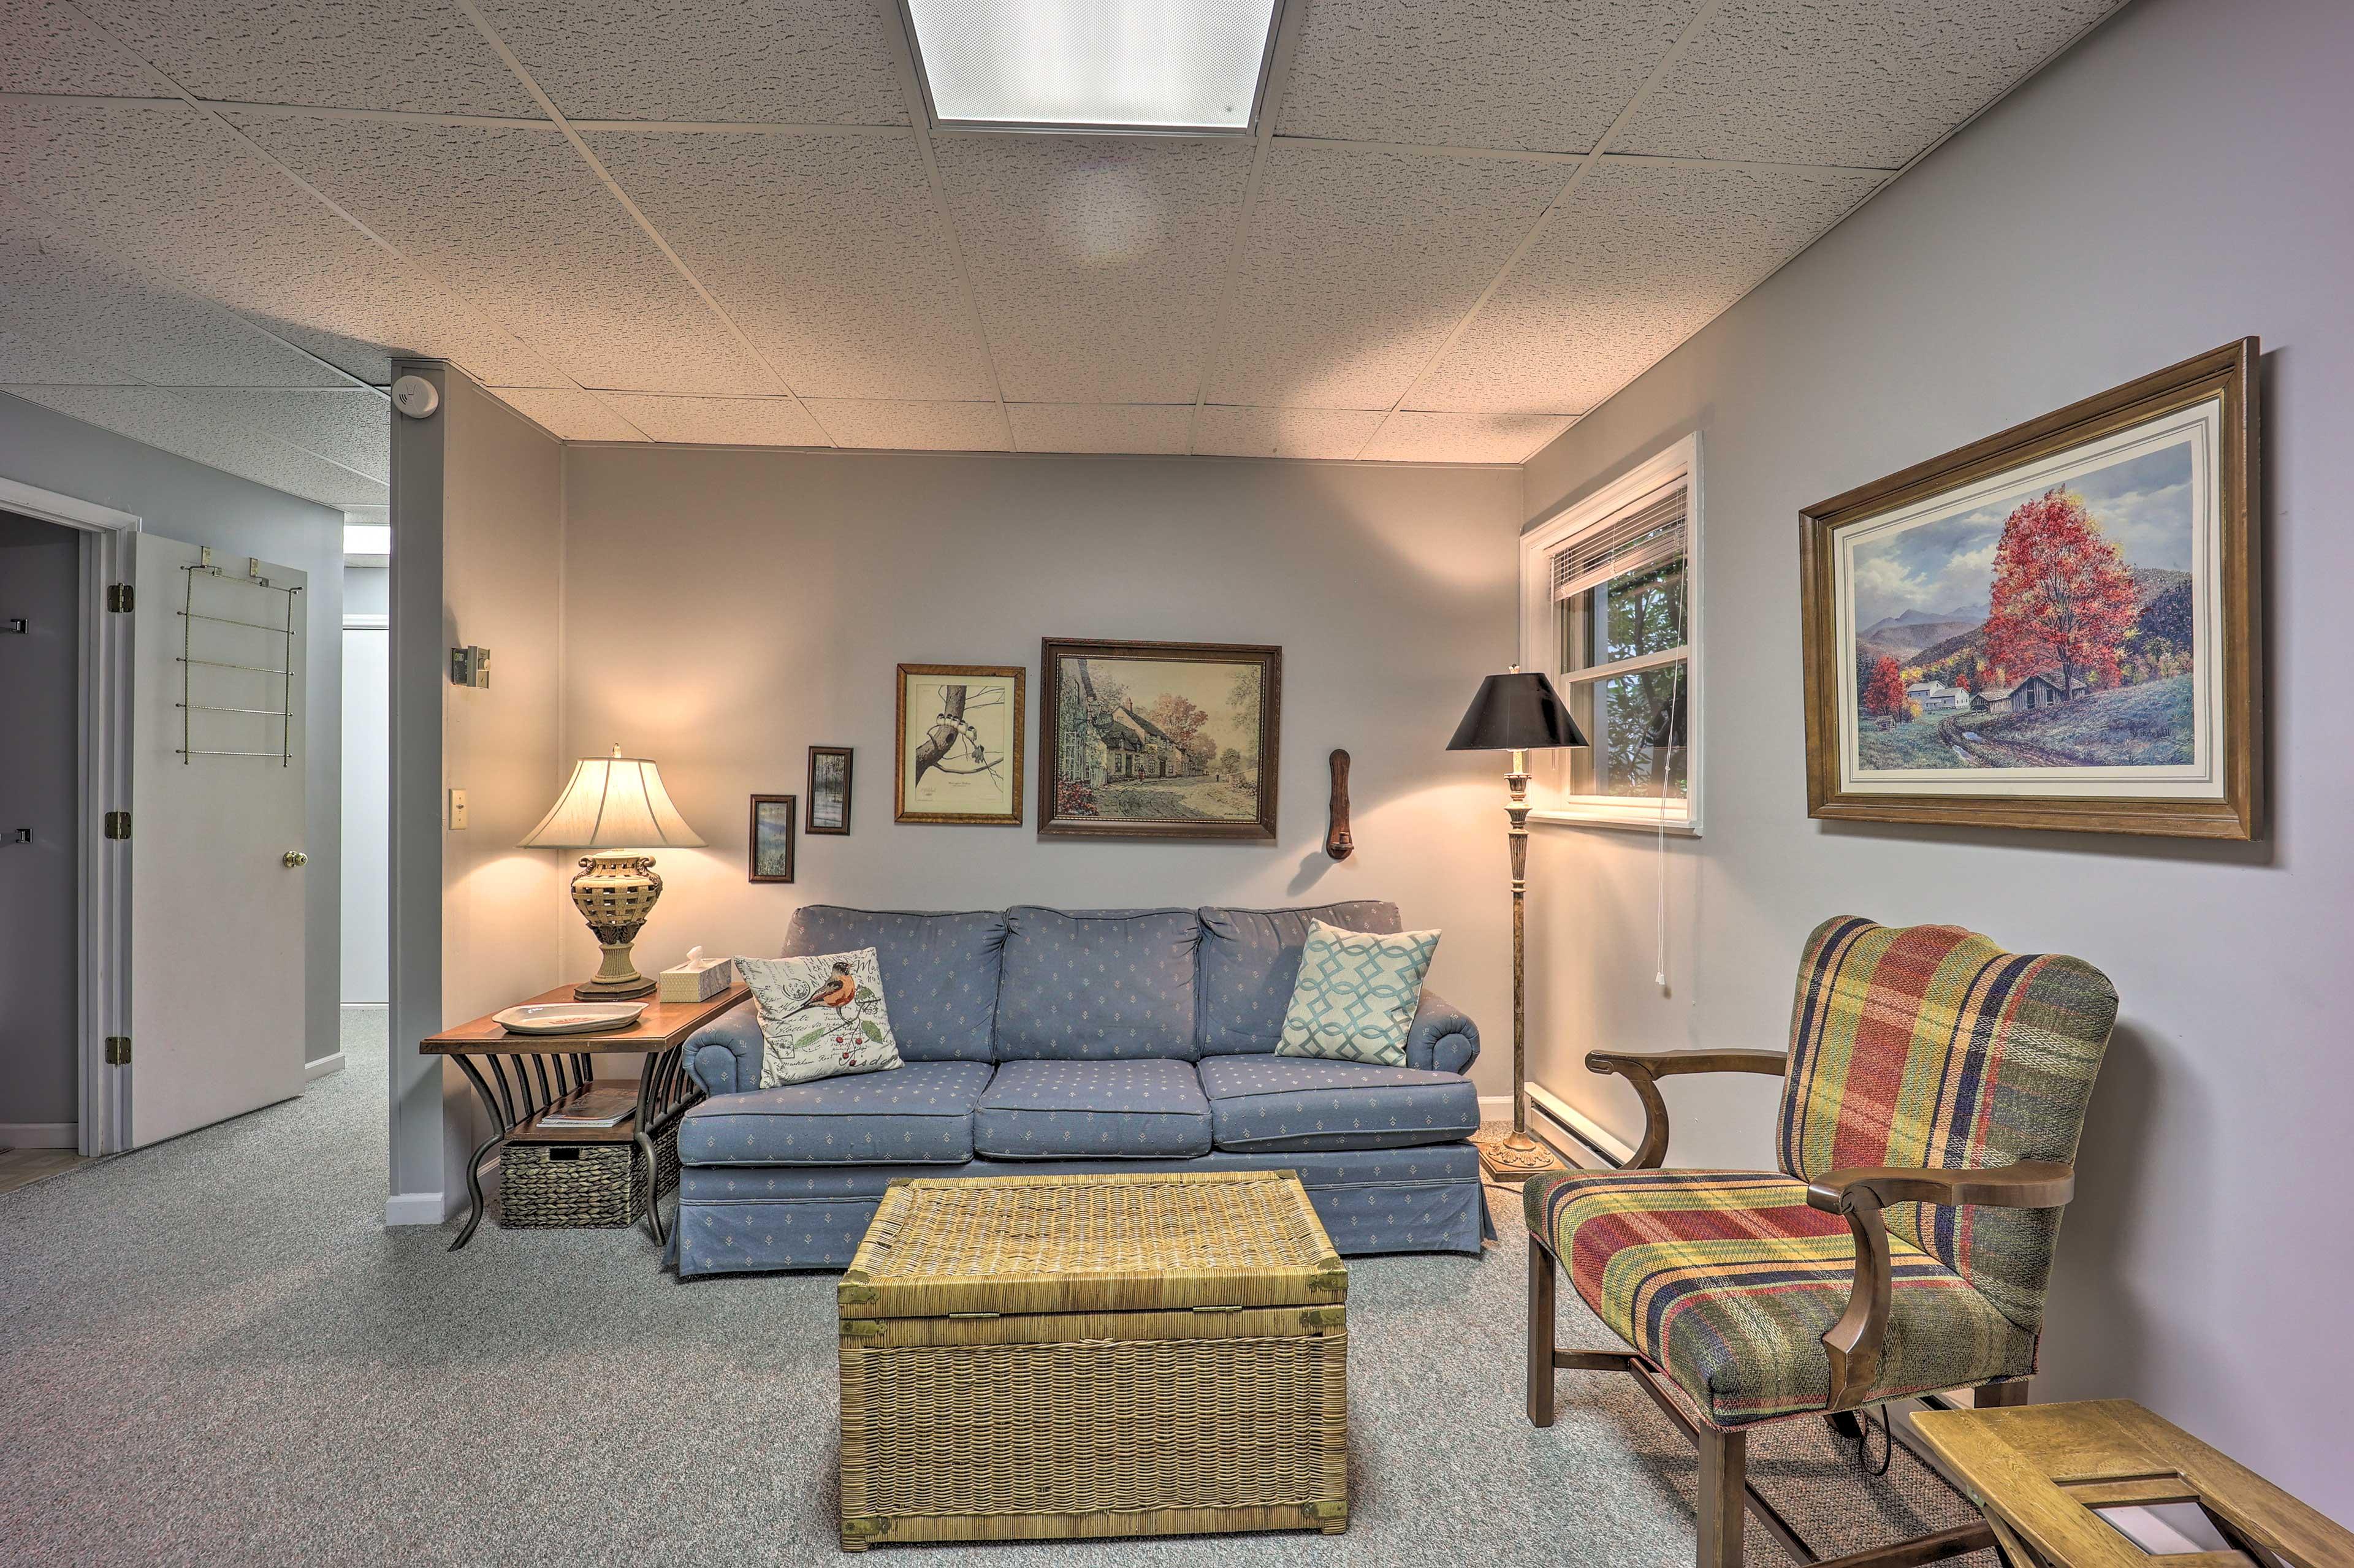 Lower-Level Living Room | Free WiFi